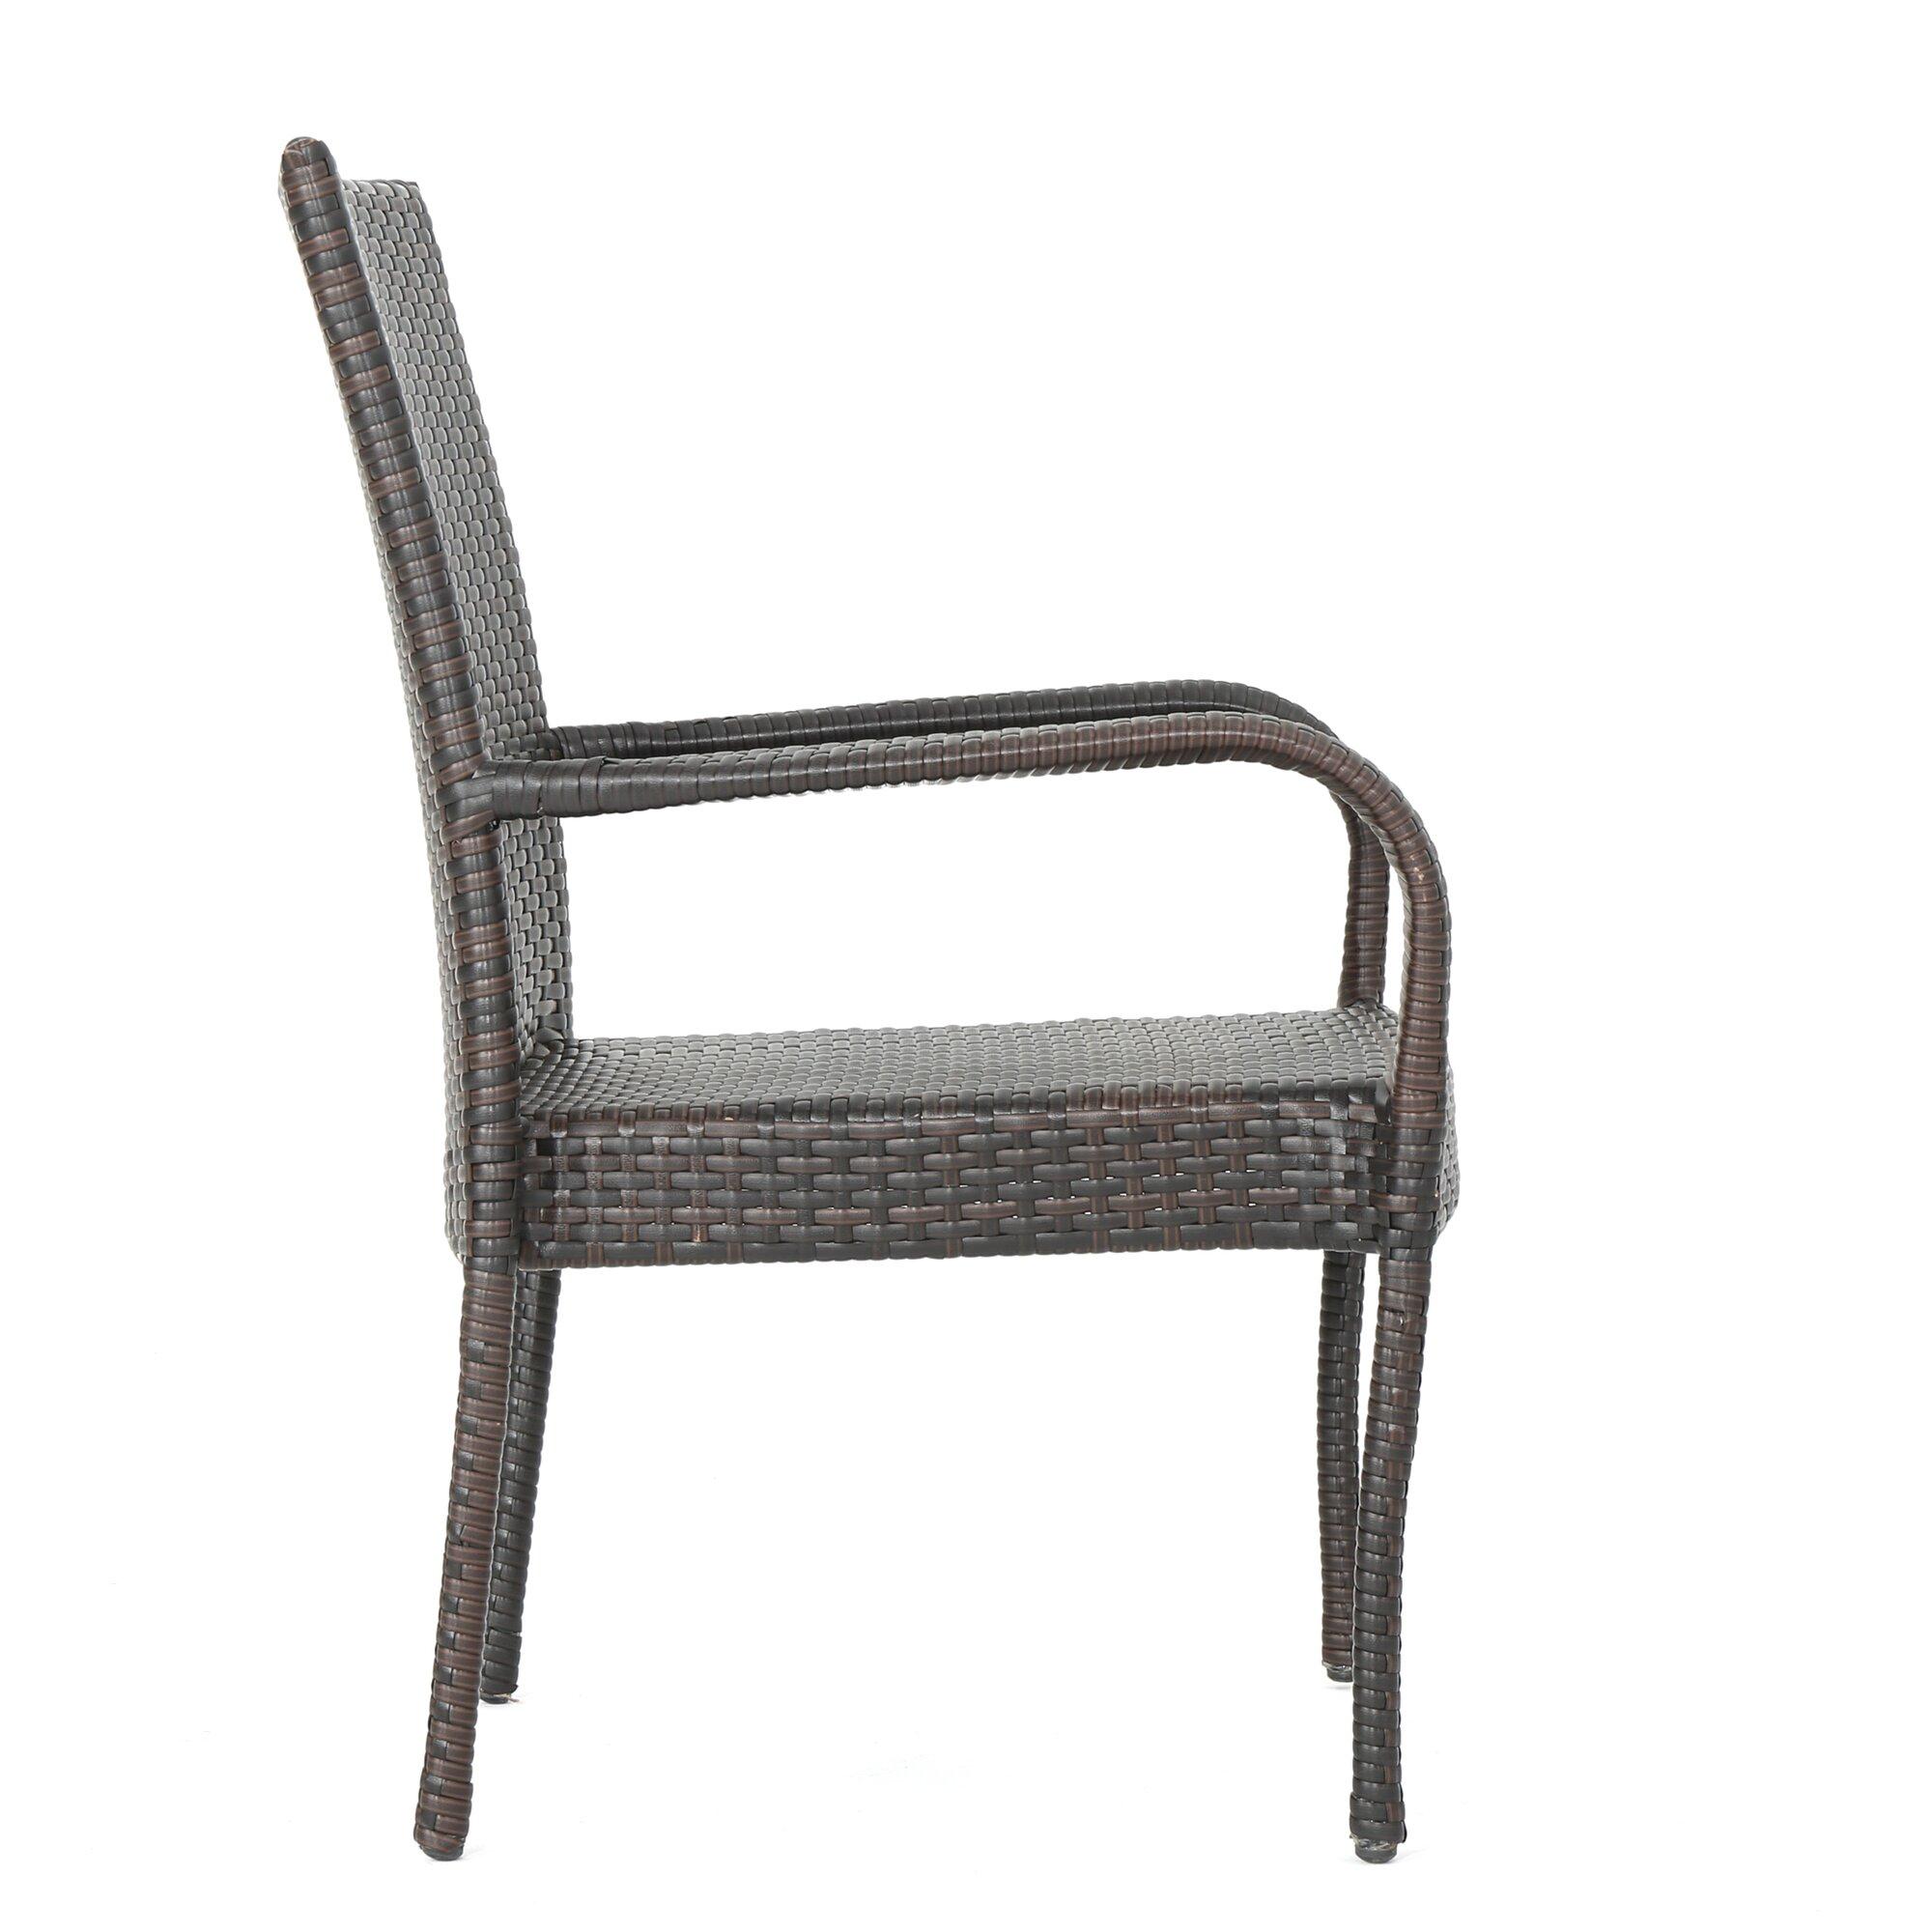 Aislin Outdoor Wicker 3 Piece Lounge Seating Group : Joss u0026 Main